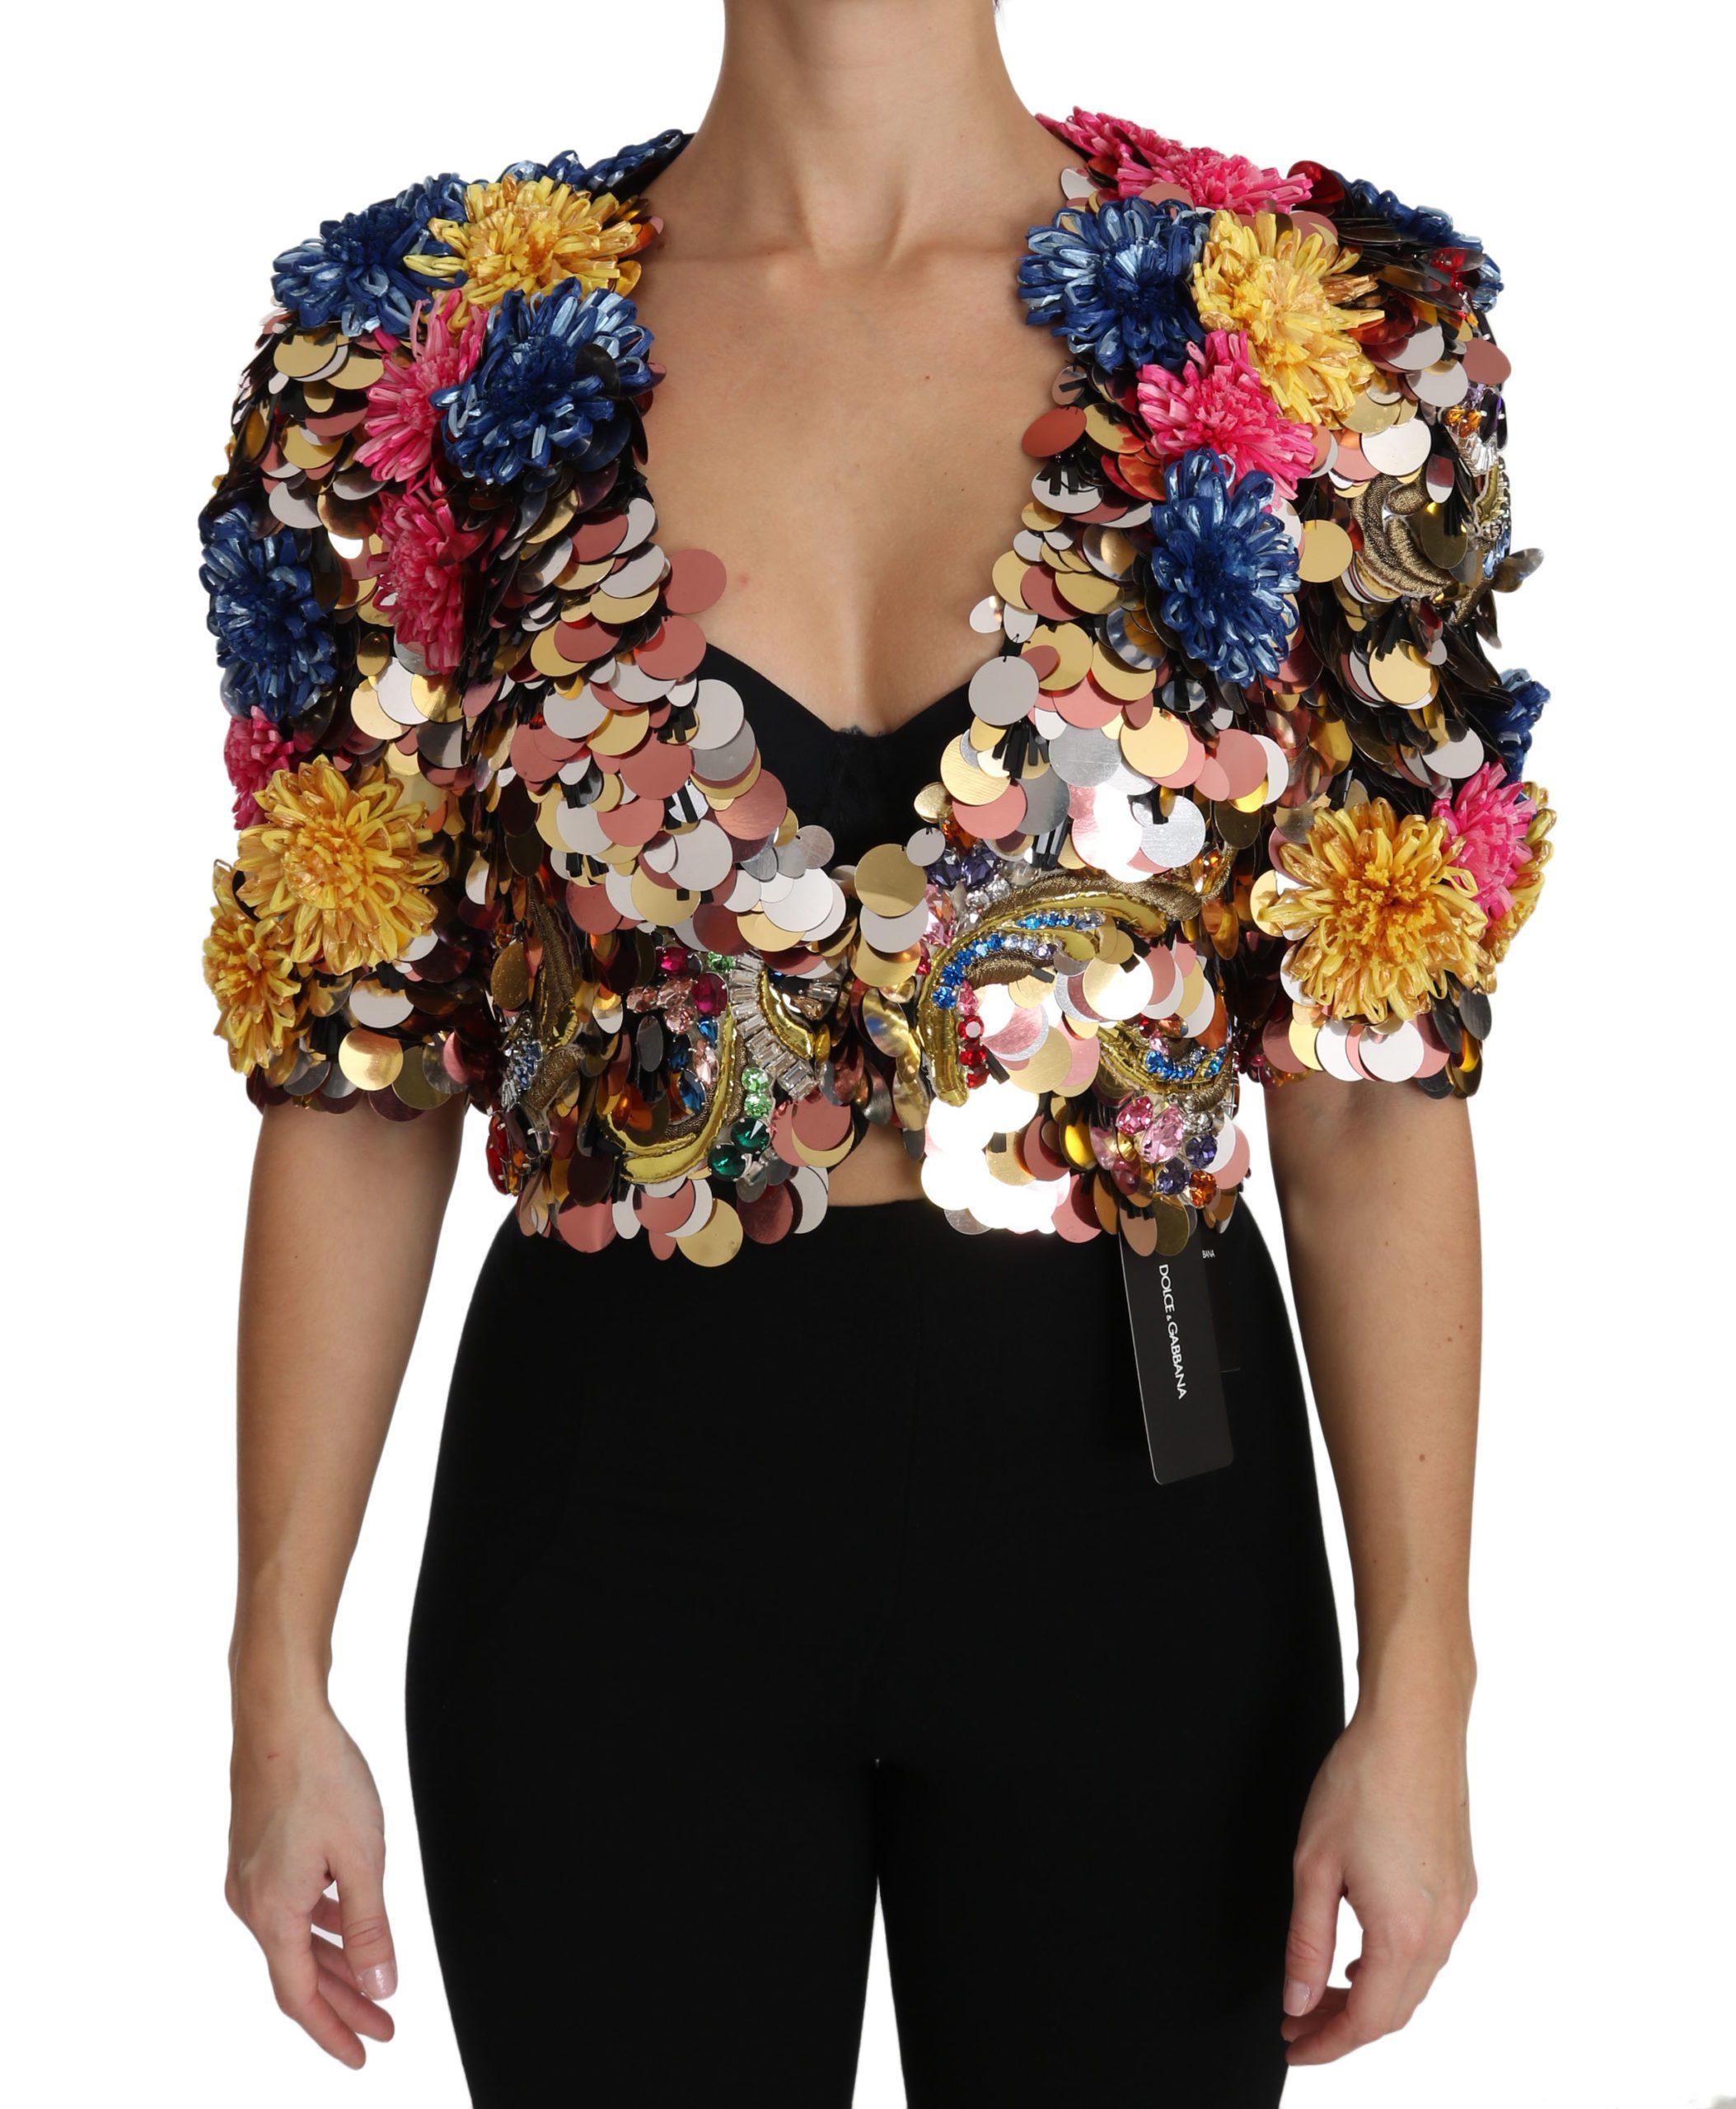 Dolce & Gabbana Women's Crystal Sequined Floral Coat Multicolor JKT2409 - IT36 | XS